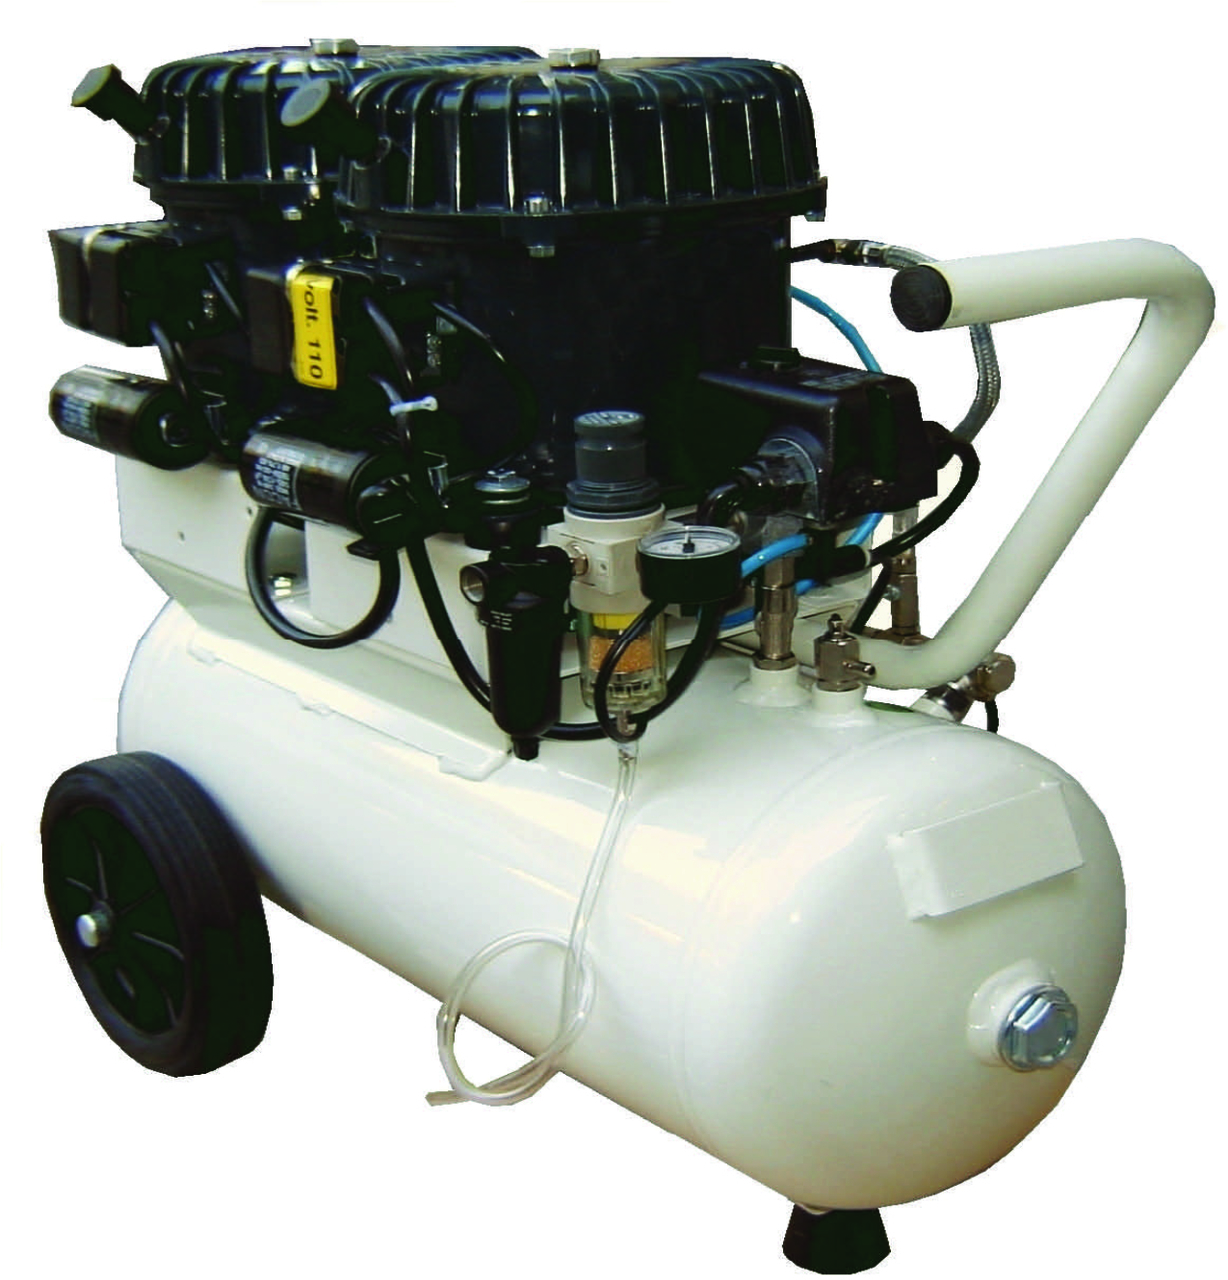 Val-Air 100-24 AL 2 x 1/2 HP Single Phase 6 Gallon Silent Air Compressor by Silentaire Technologies